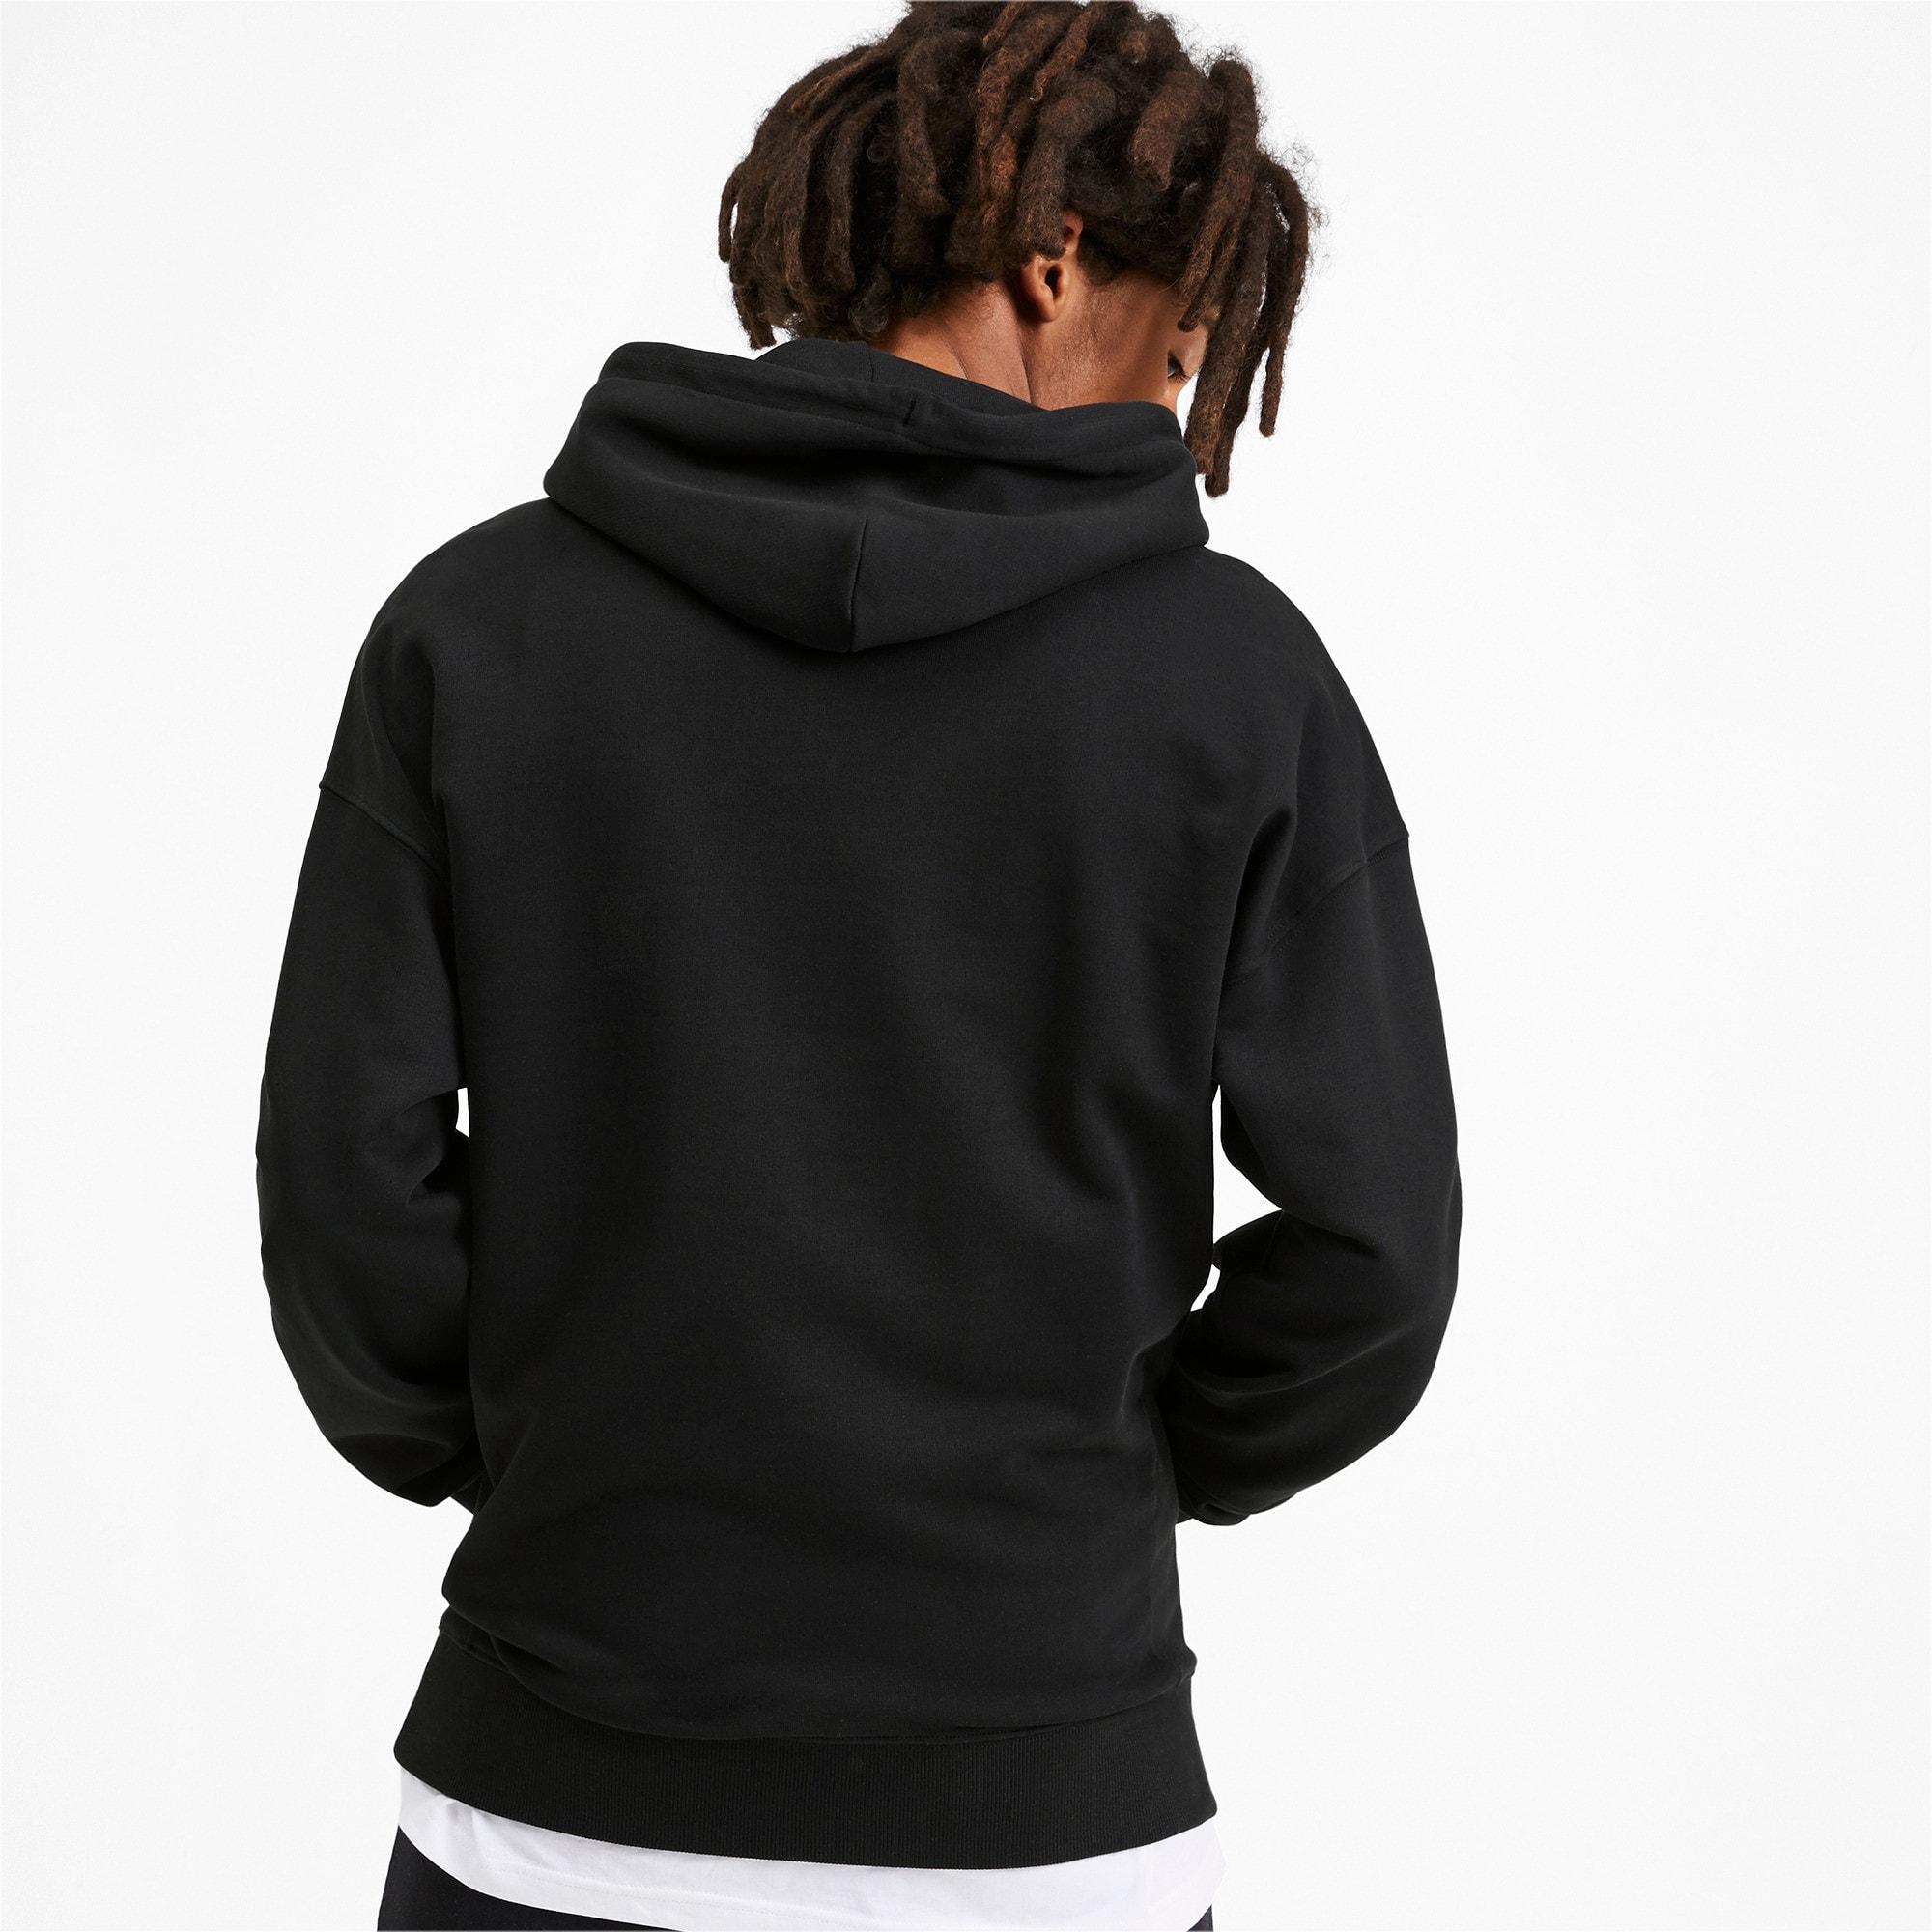 Miniatura 2 de Chaqueta con capucha para hombre OG, Puma Black, mediano